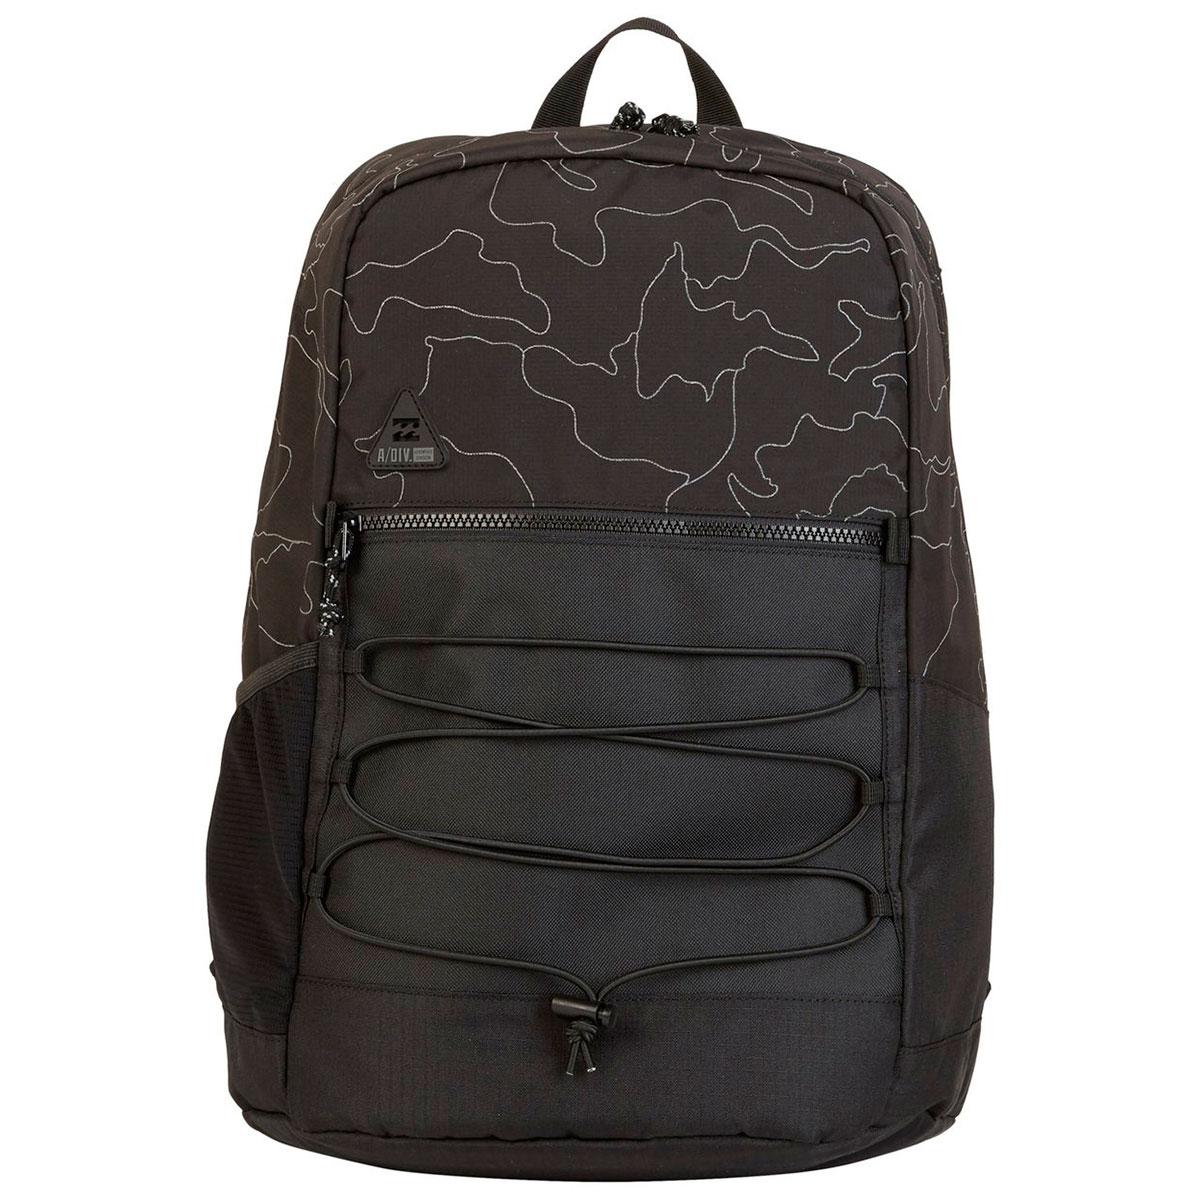 Рюкзак Billabong Axis Day Pack